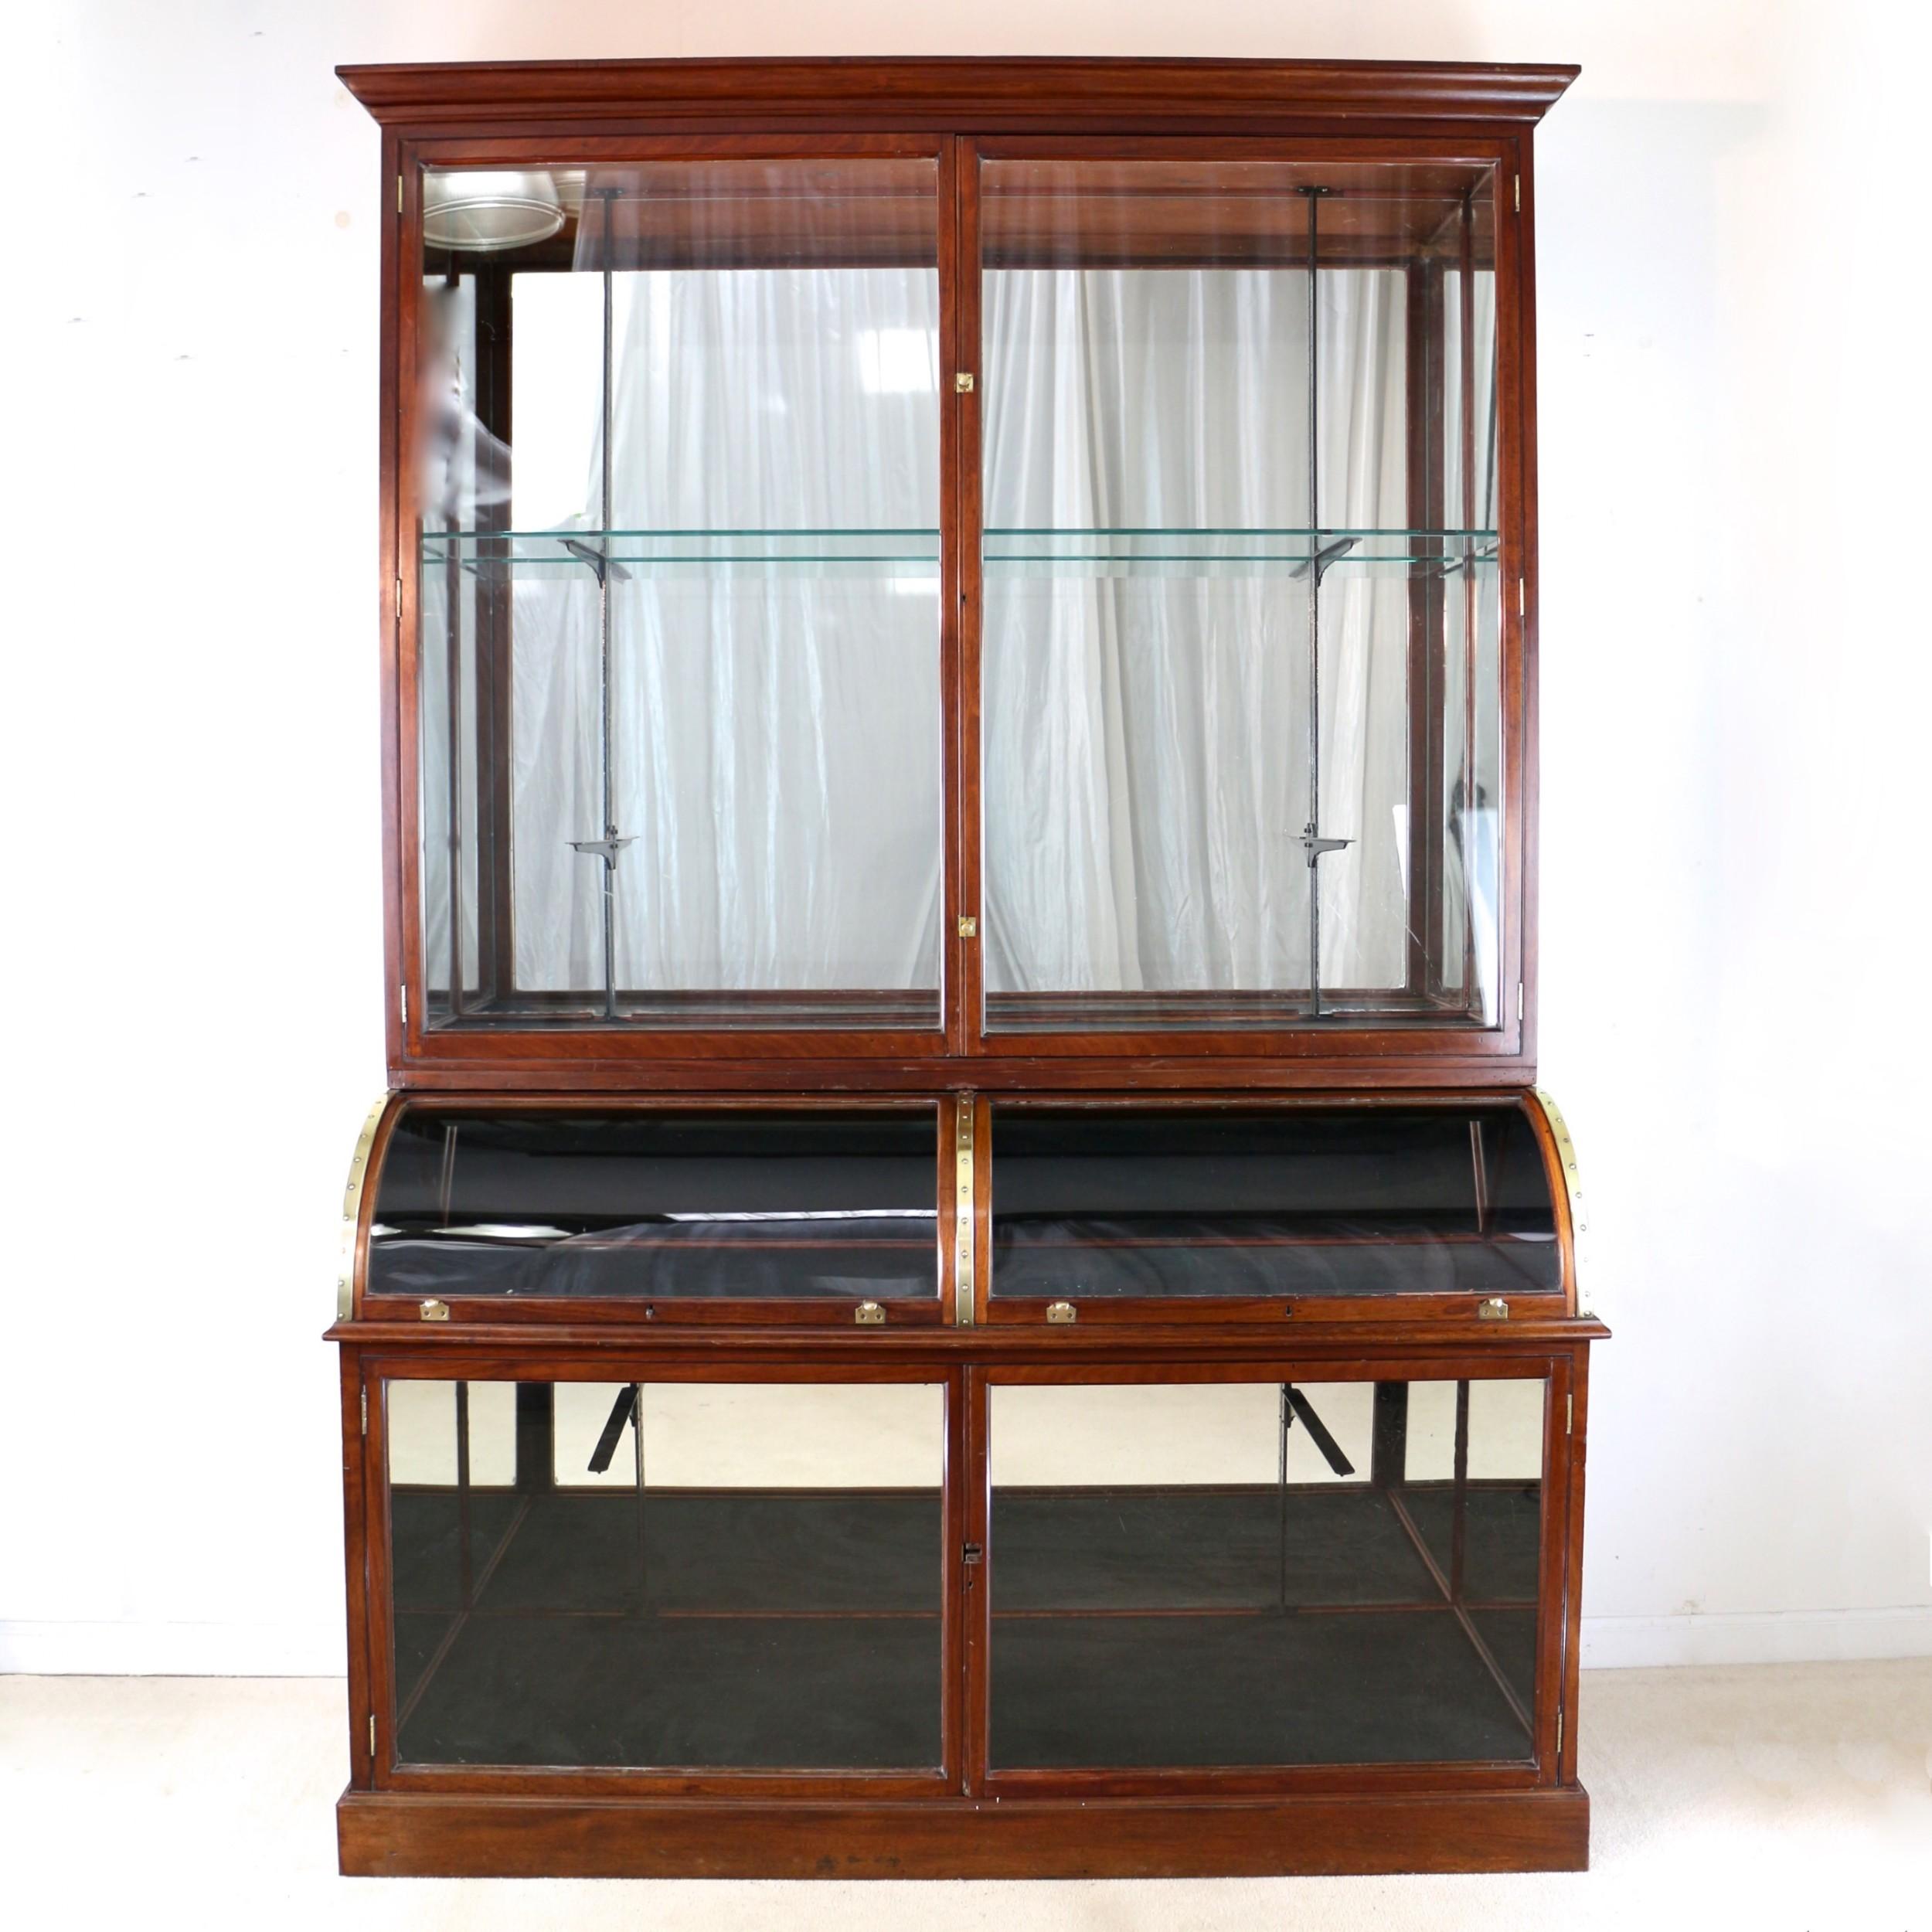 victorian mahogany shop or jewellery display cabinet